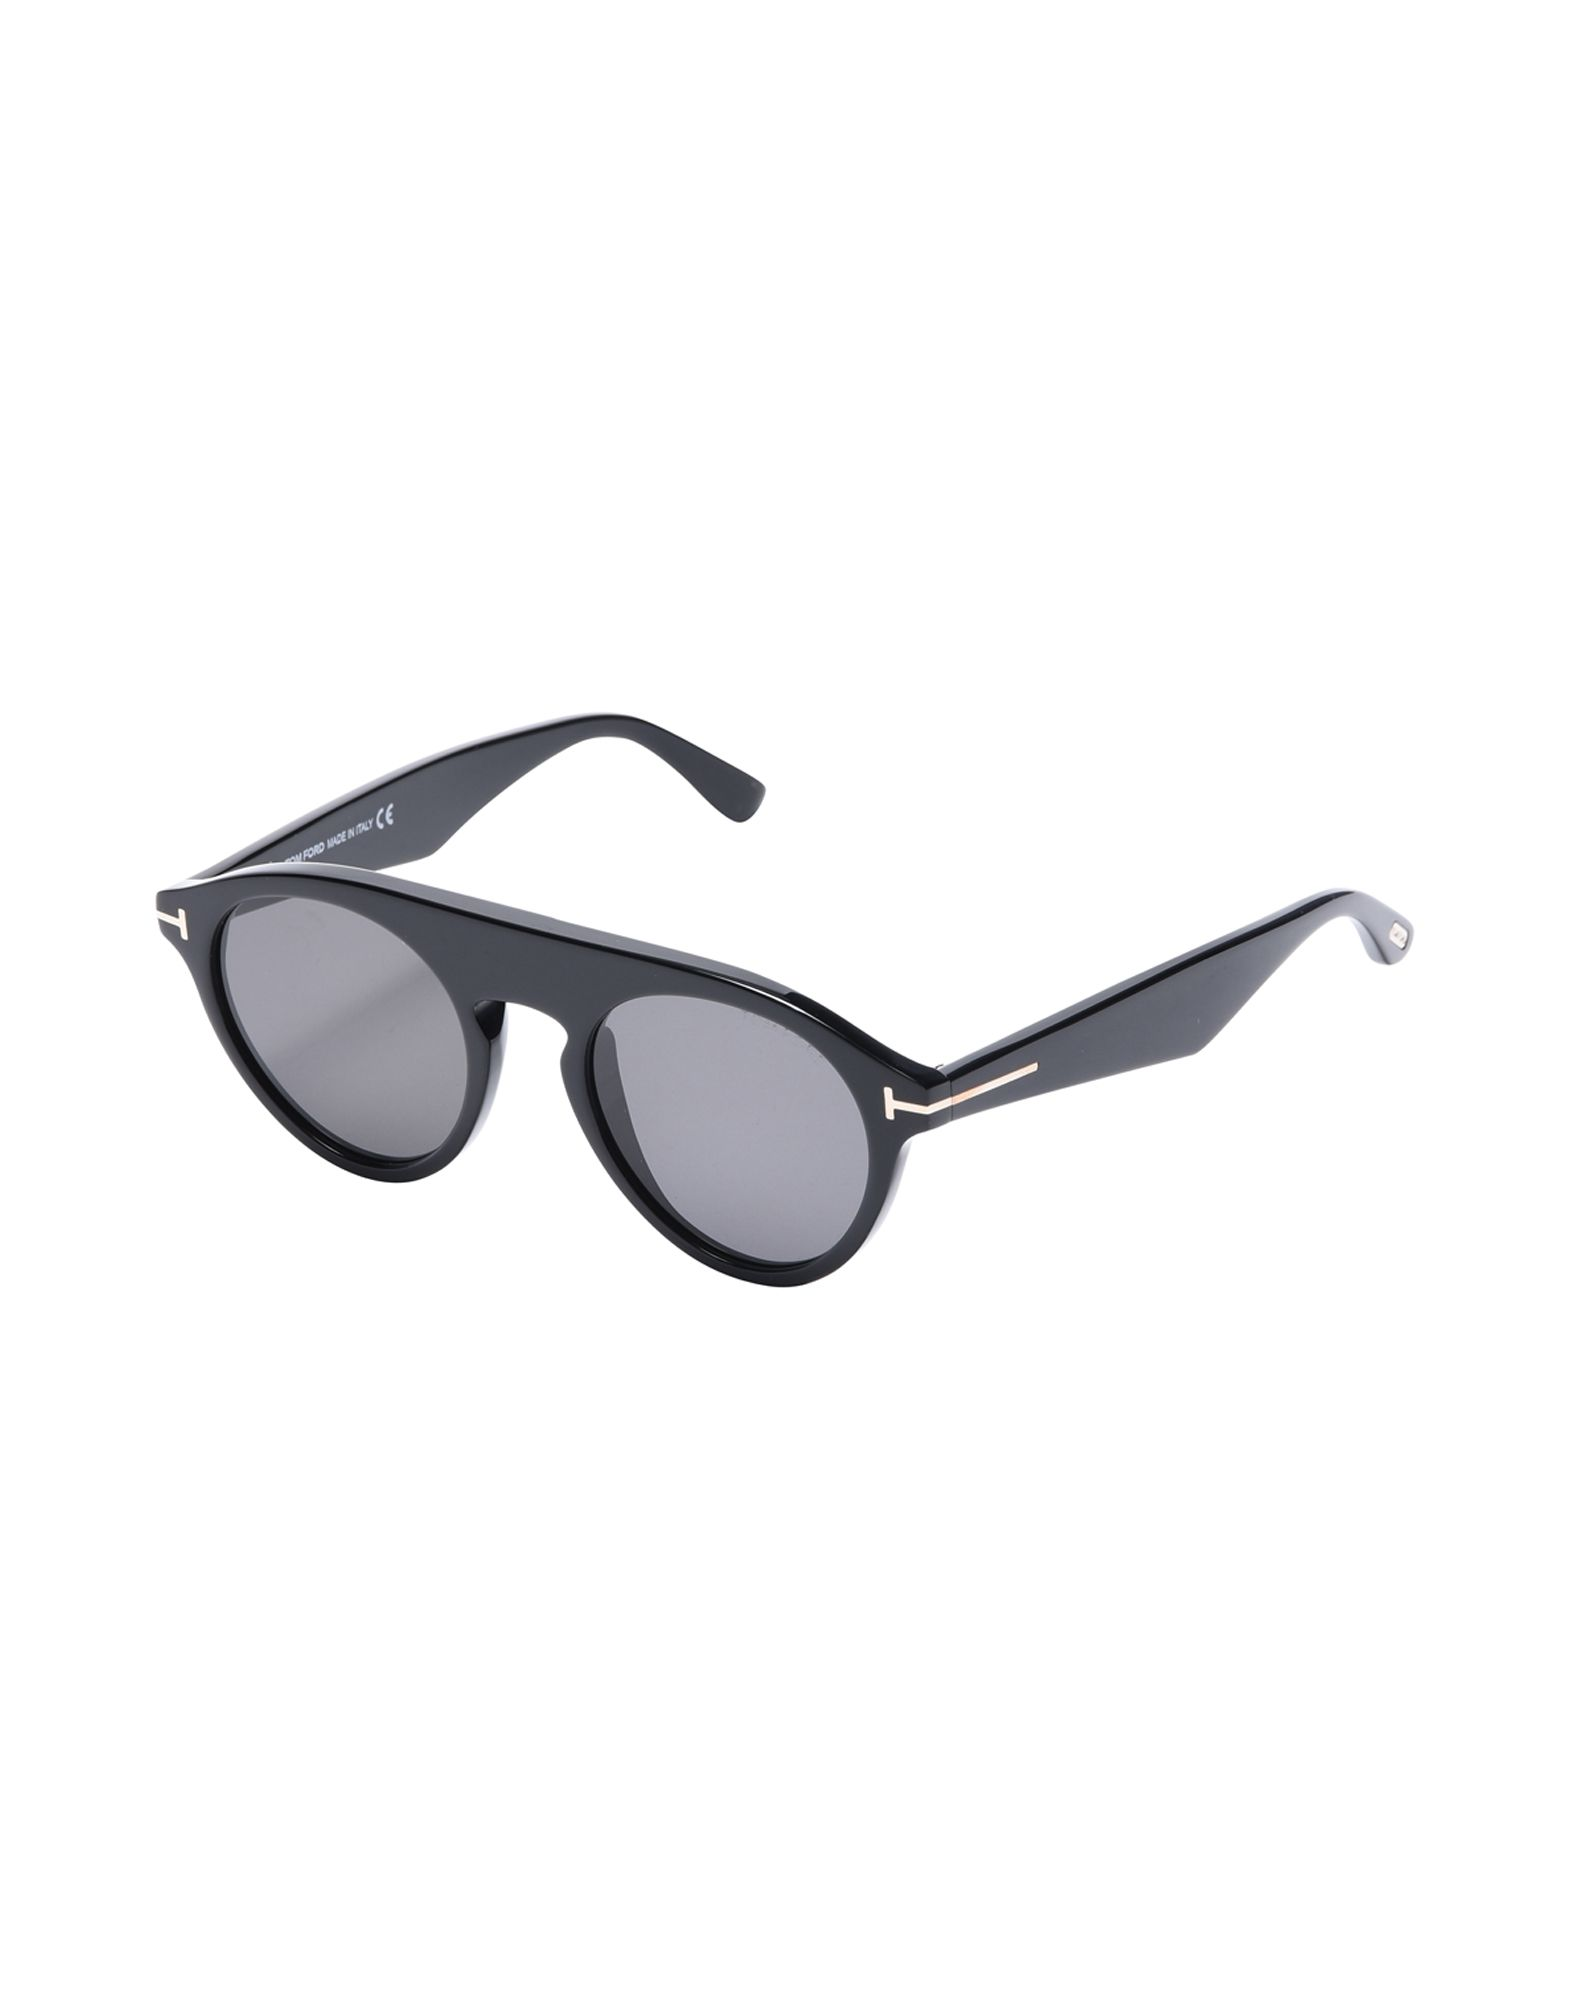 TOM FORD Солнечные очки tom ford tom ford дезодорант стик neroli portofino 75 мл